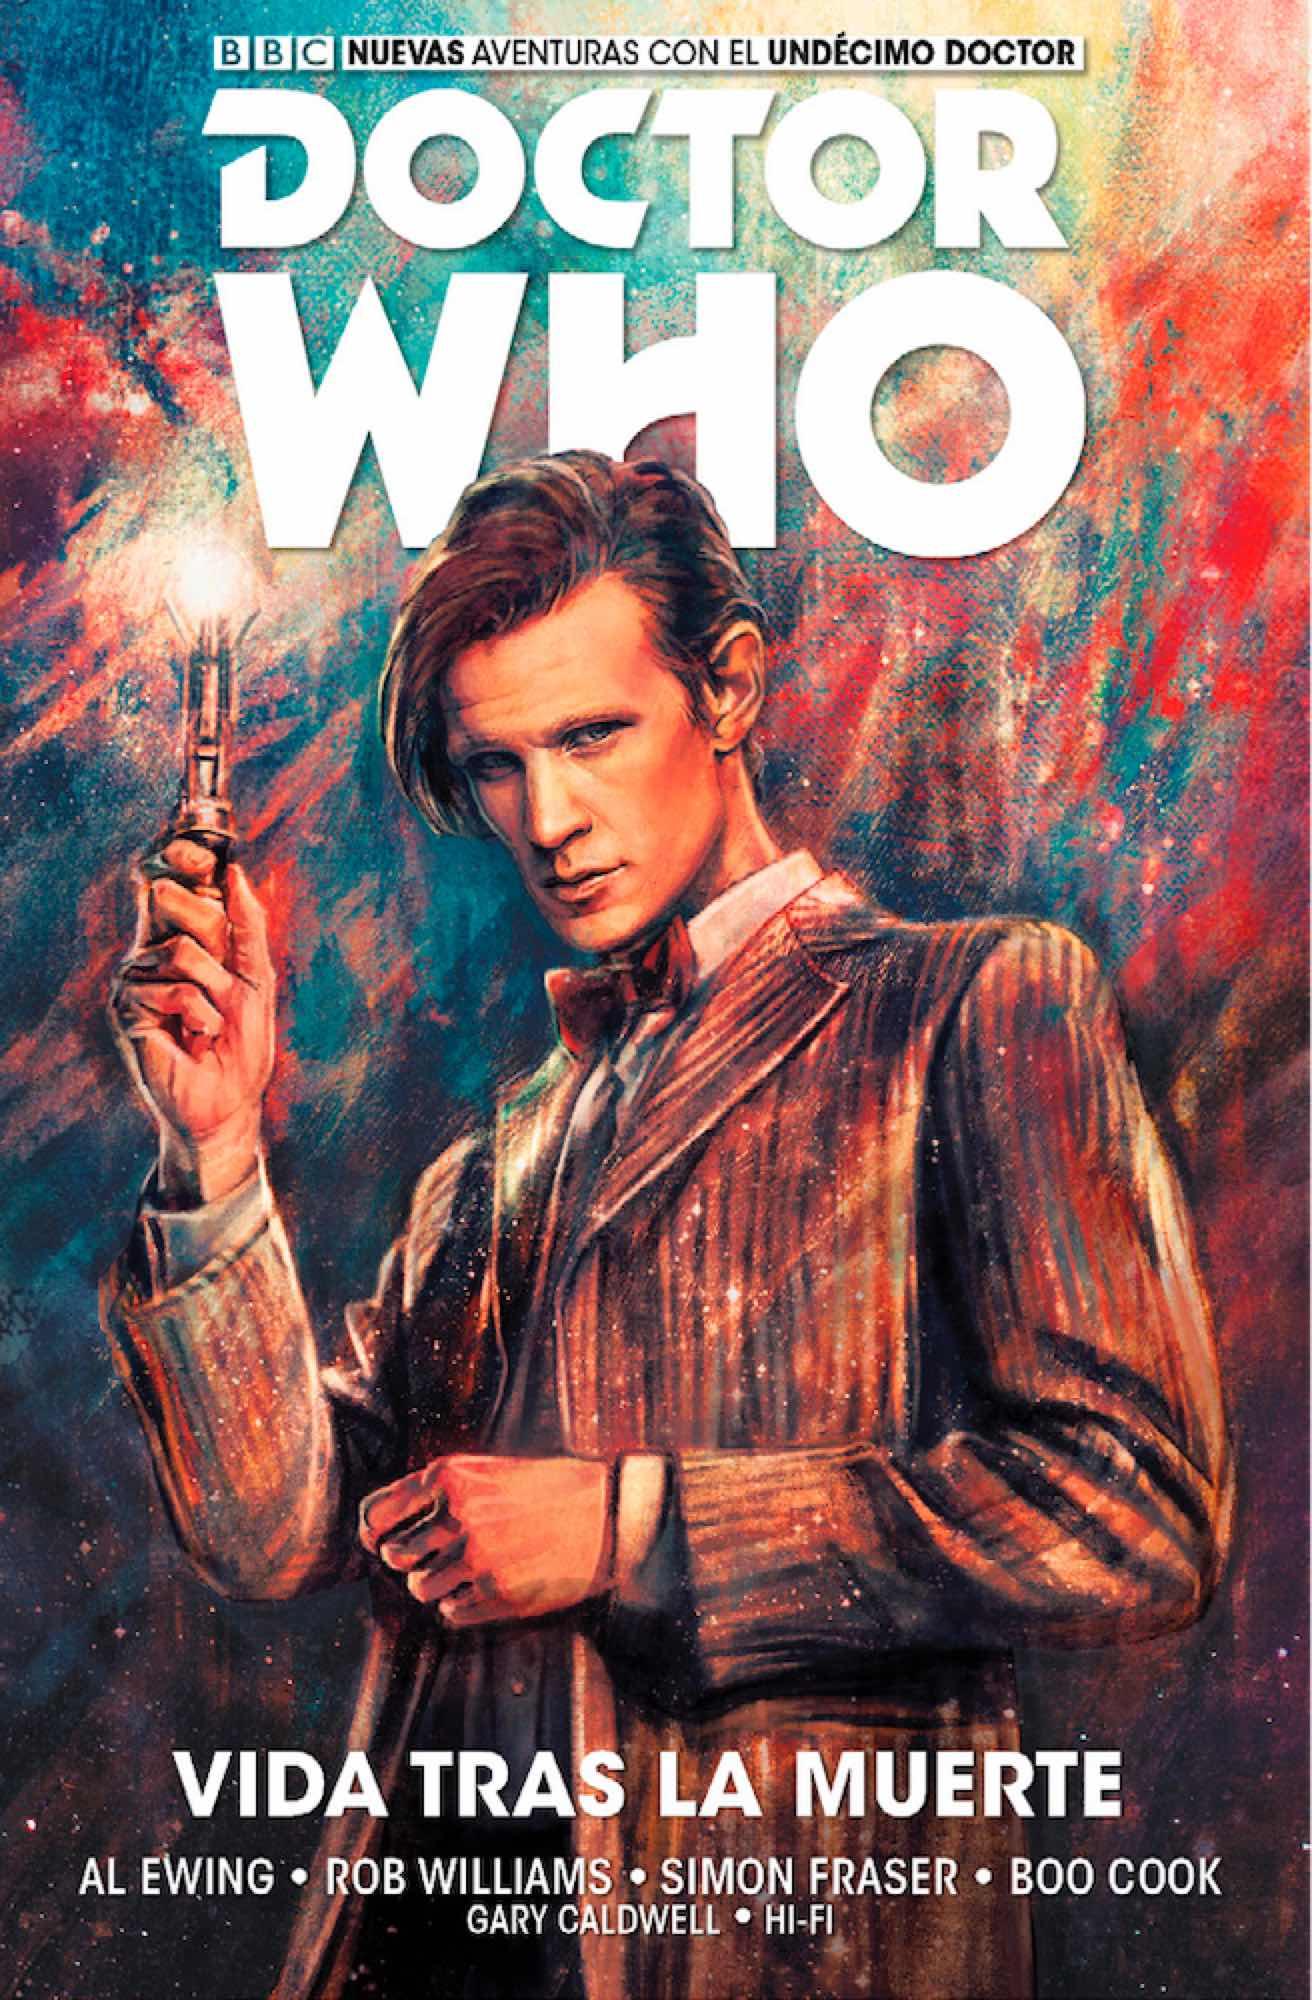 DOCTOR WHO. VIDA TRAS LA MUERTE